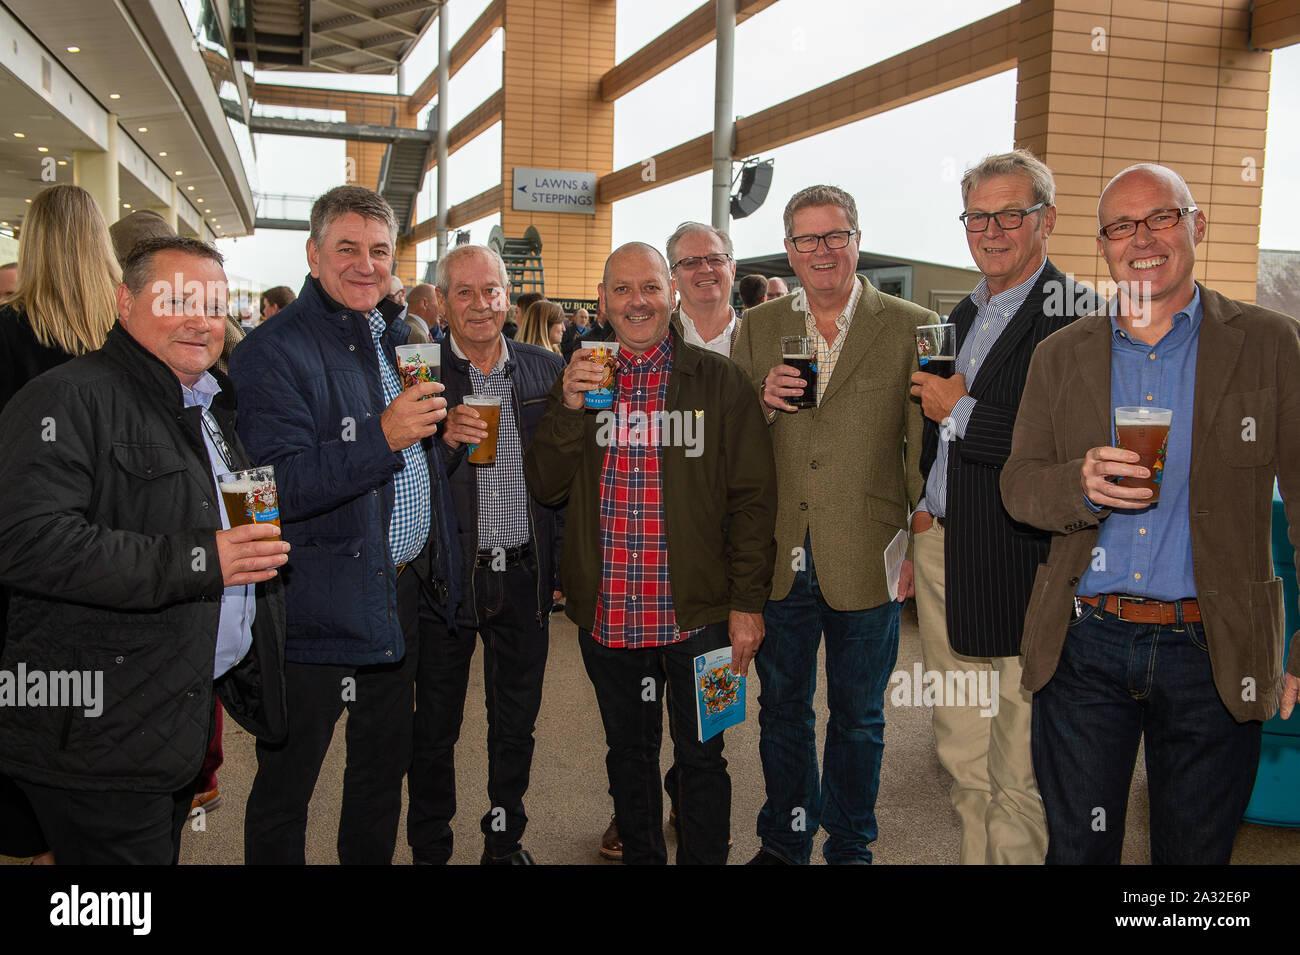 Autumn Racing Weekend & Ascot Beer Festival, Ascot Racecourse, Ascot, Berkshire, UK. 4th October, 2019.  Credit: Maureen McLean/Alamy Stock Photo